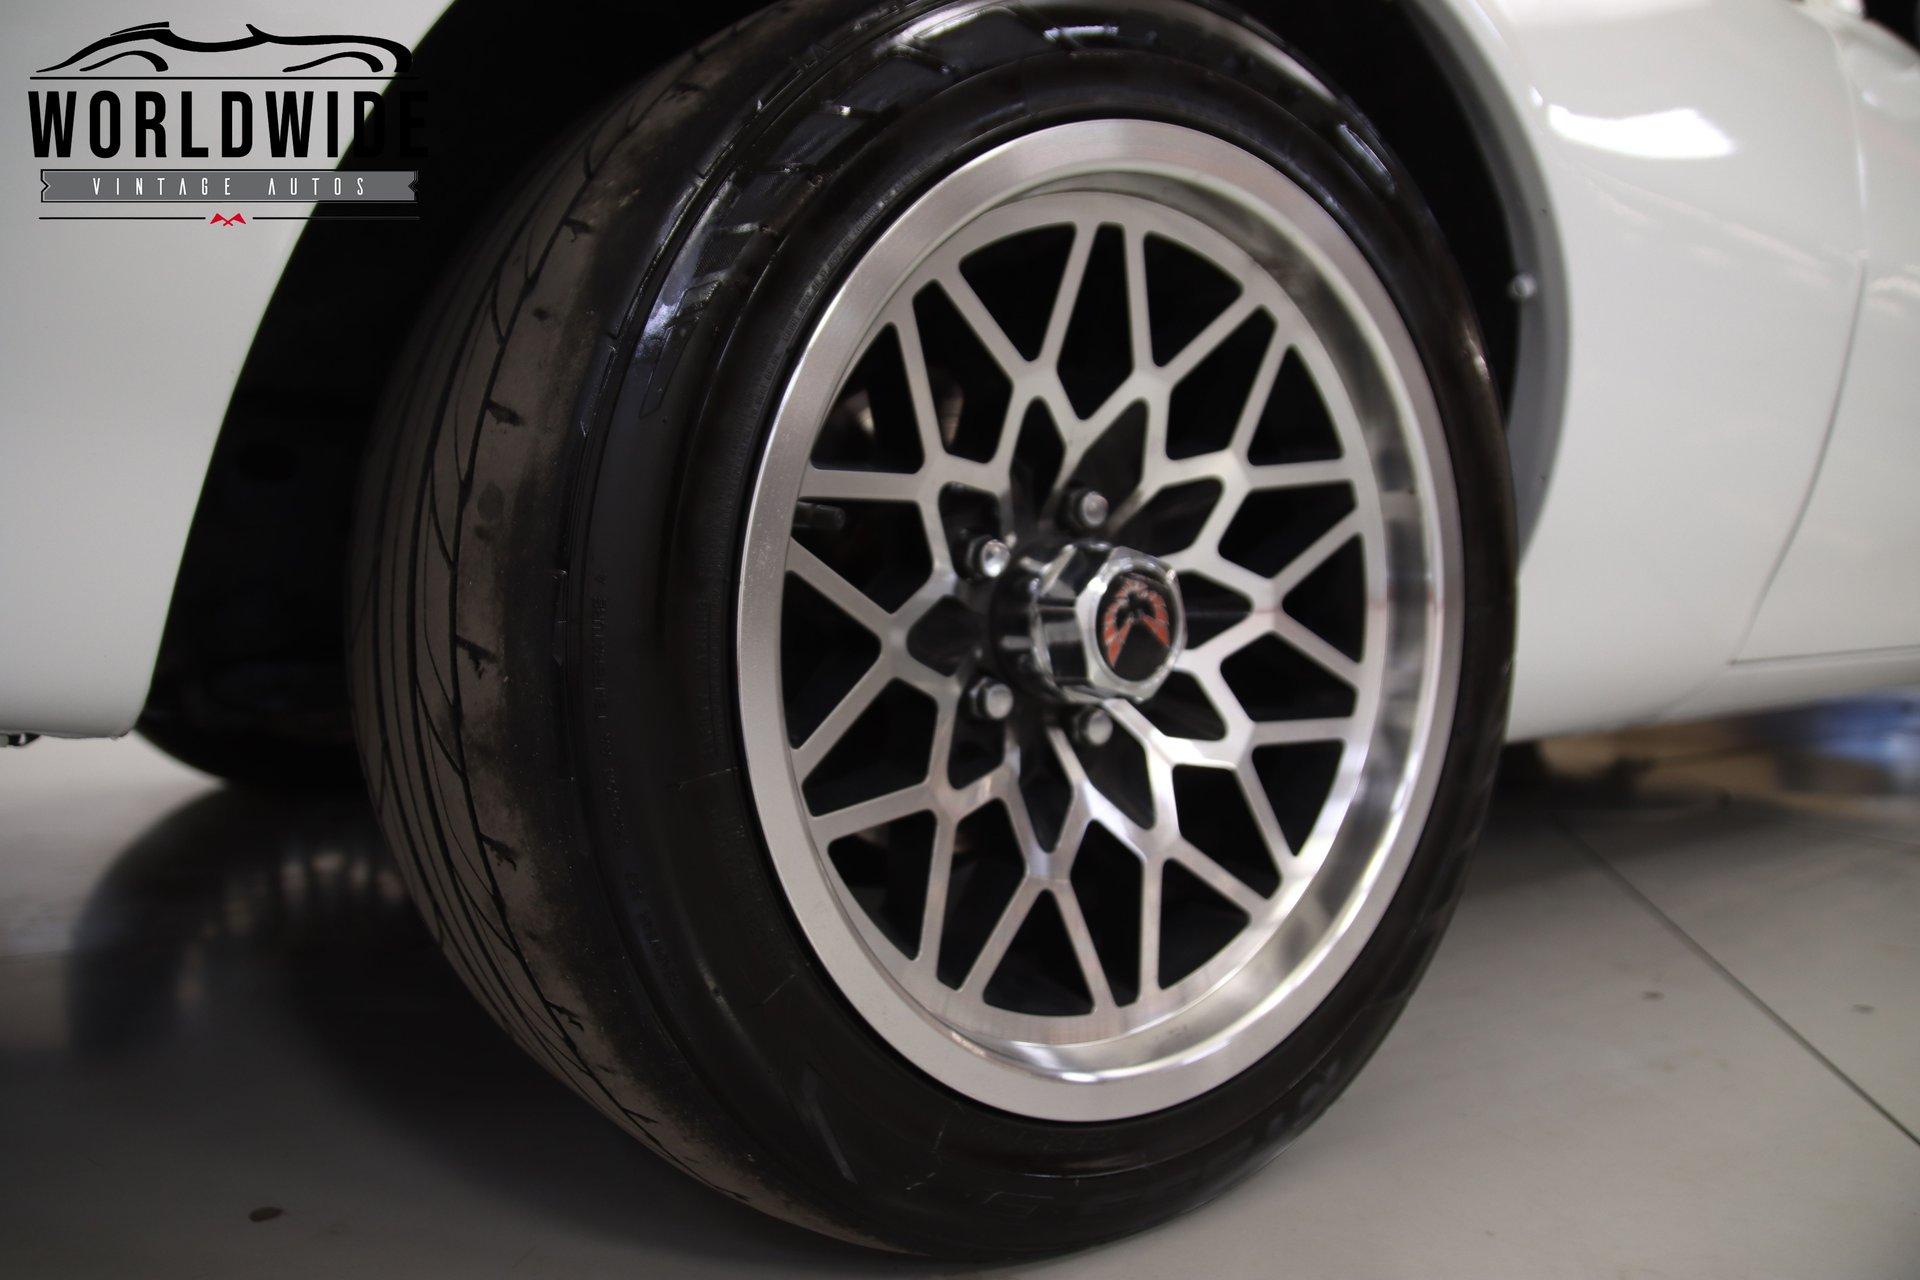 1978 Pontiac Firebird